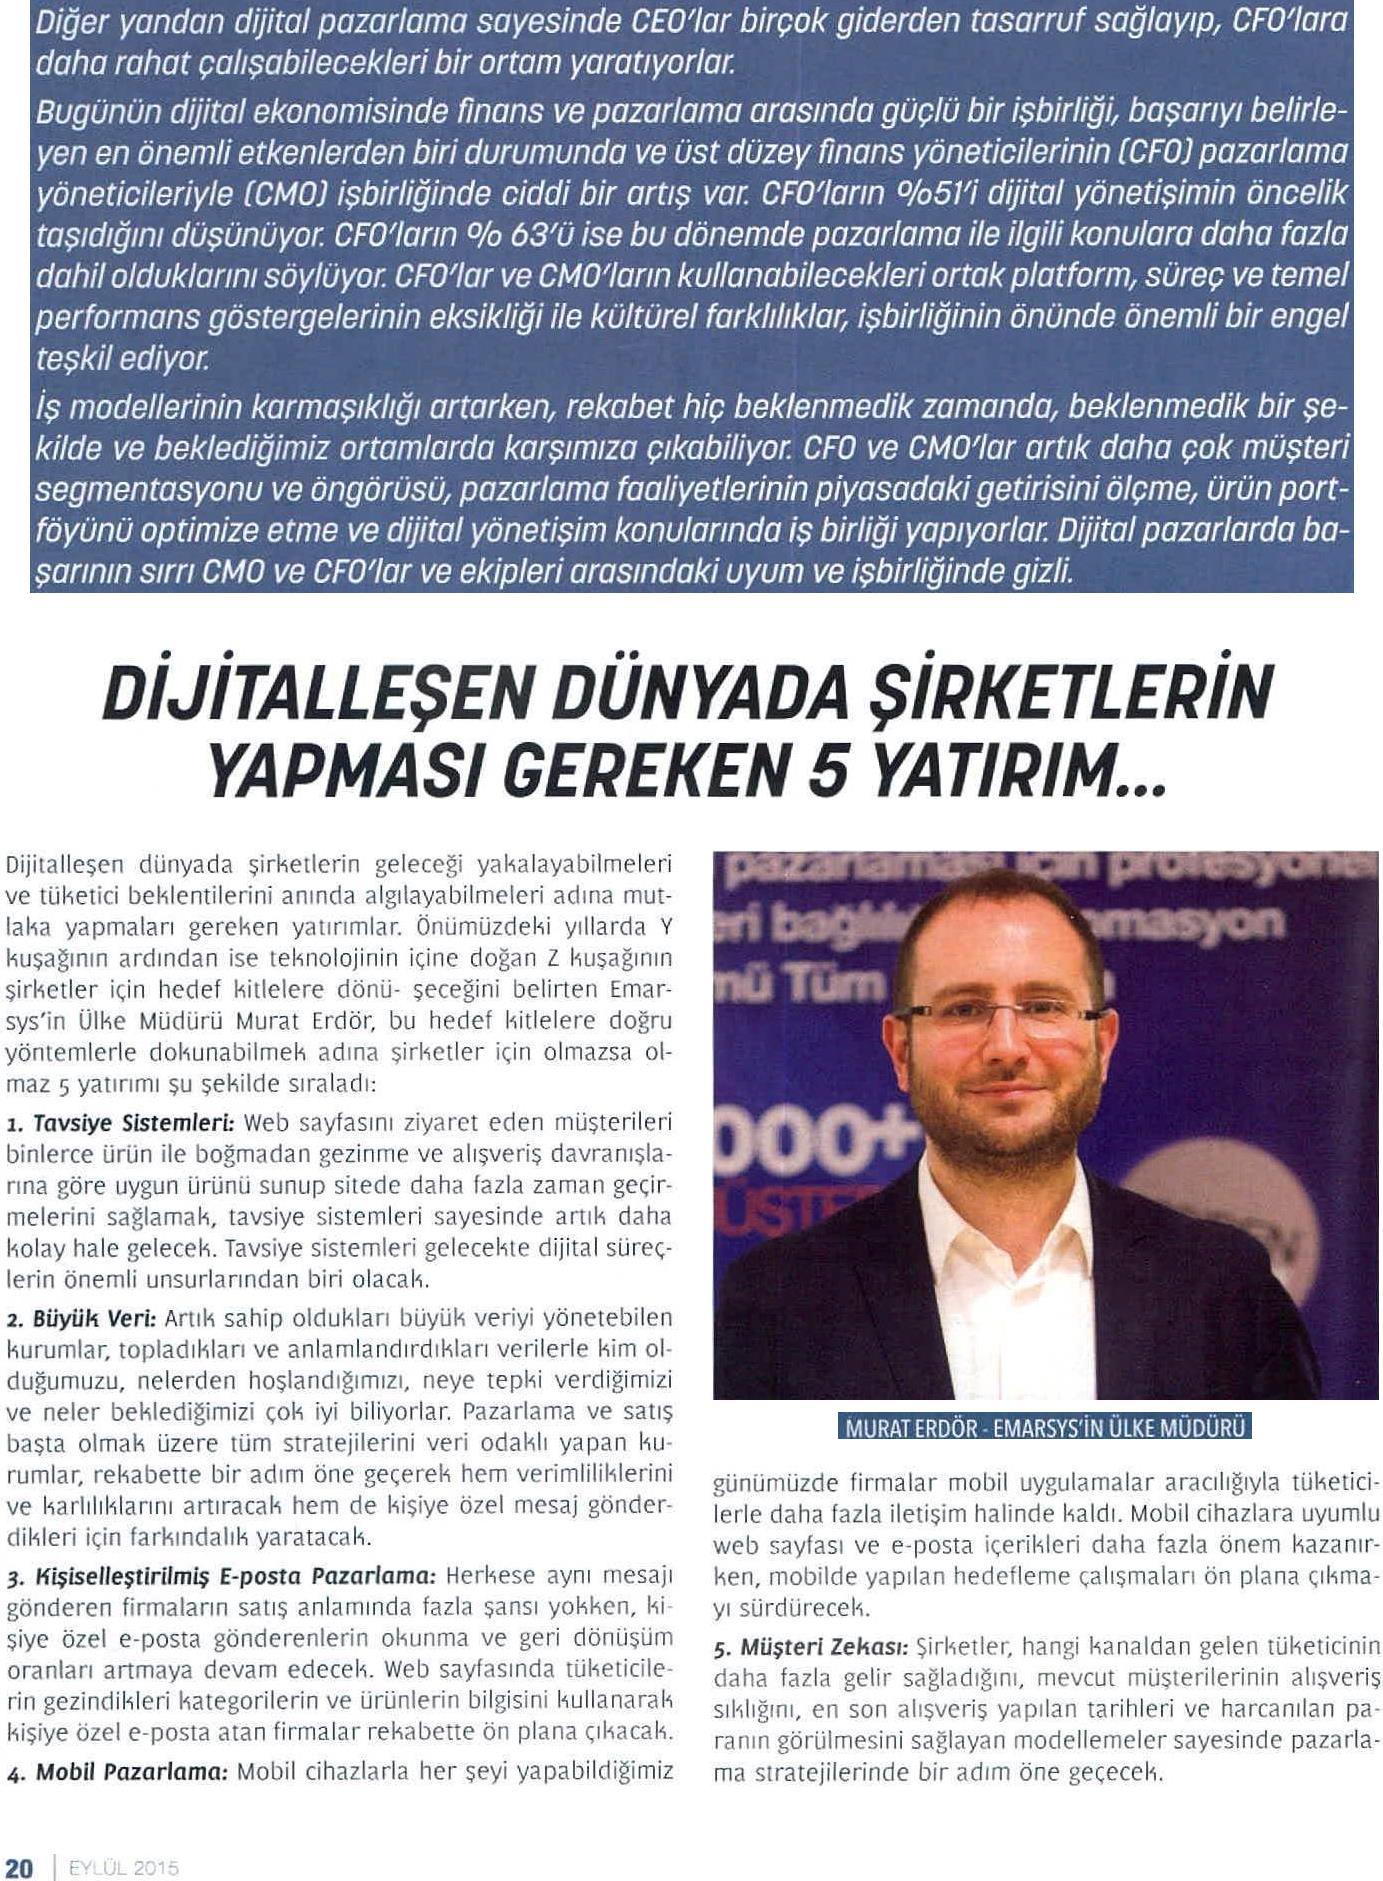 21 - Business Life Dergisi_muraterdor.com_Eylül 2015